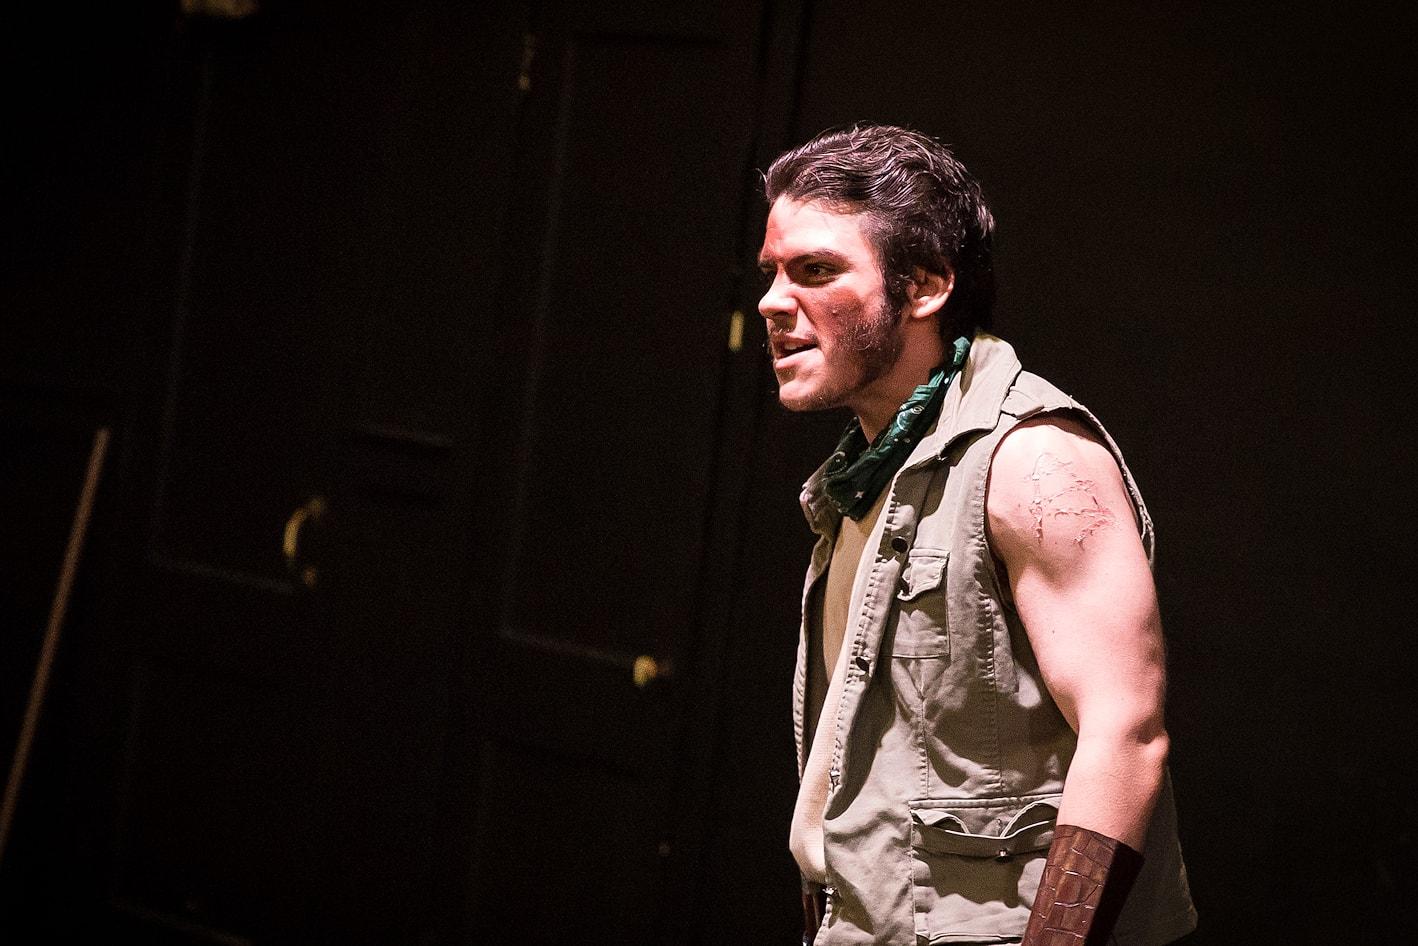 Robert Pike as Aufidius. Photo by Claire Kimball.